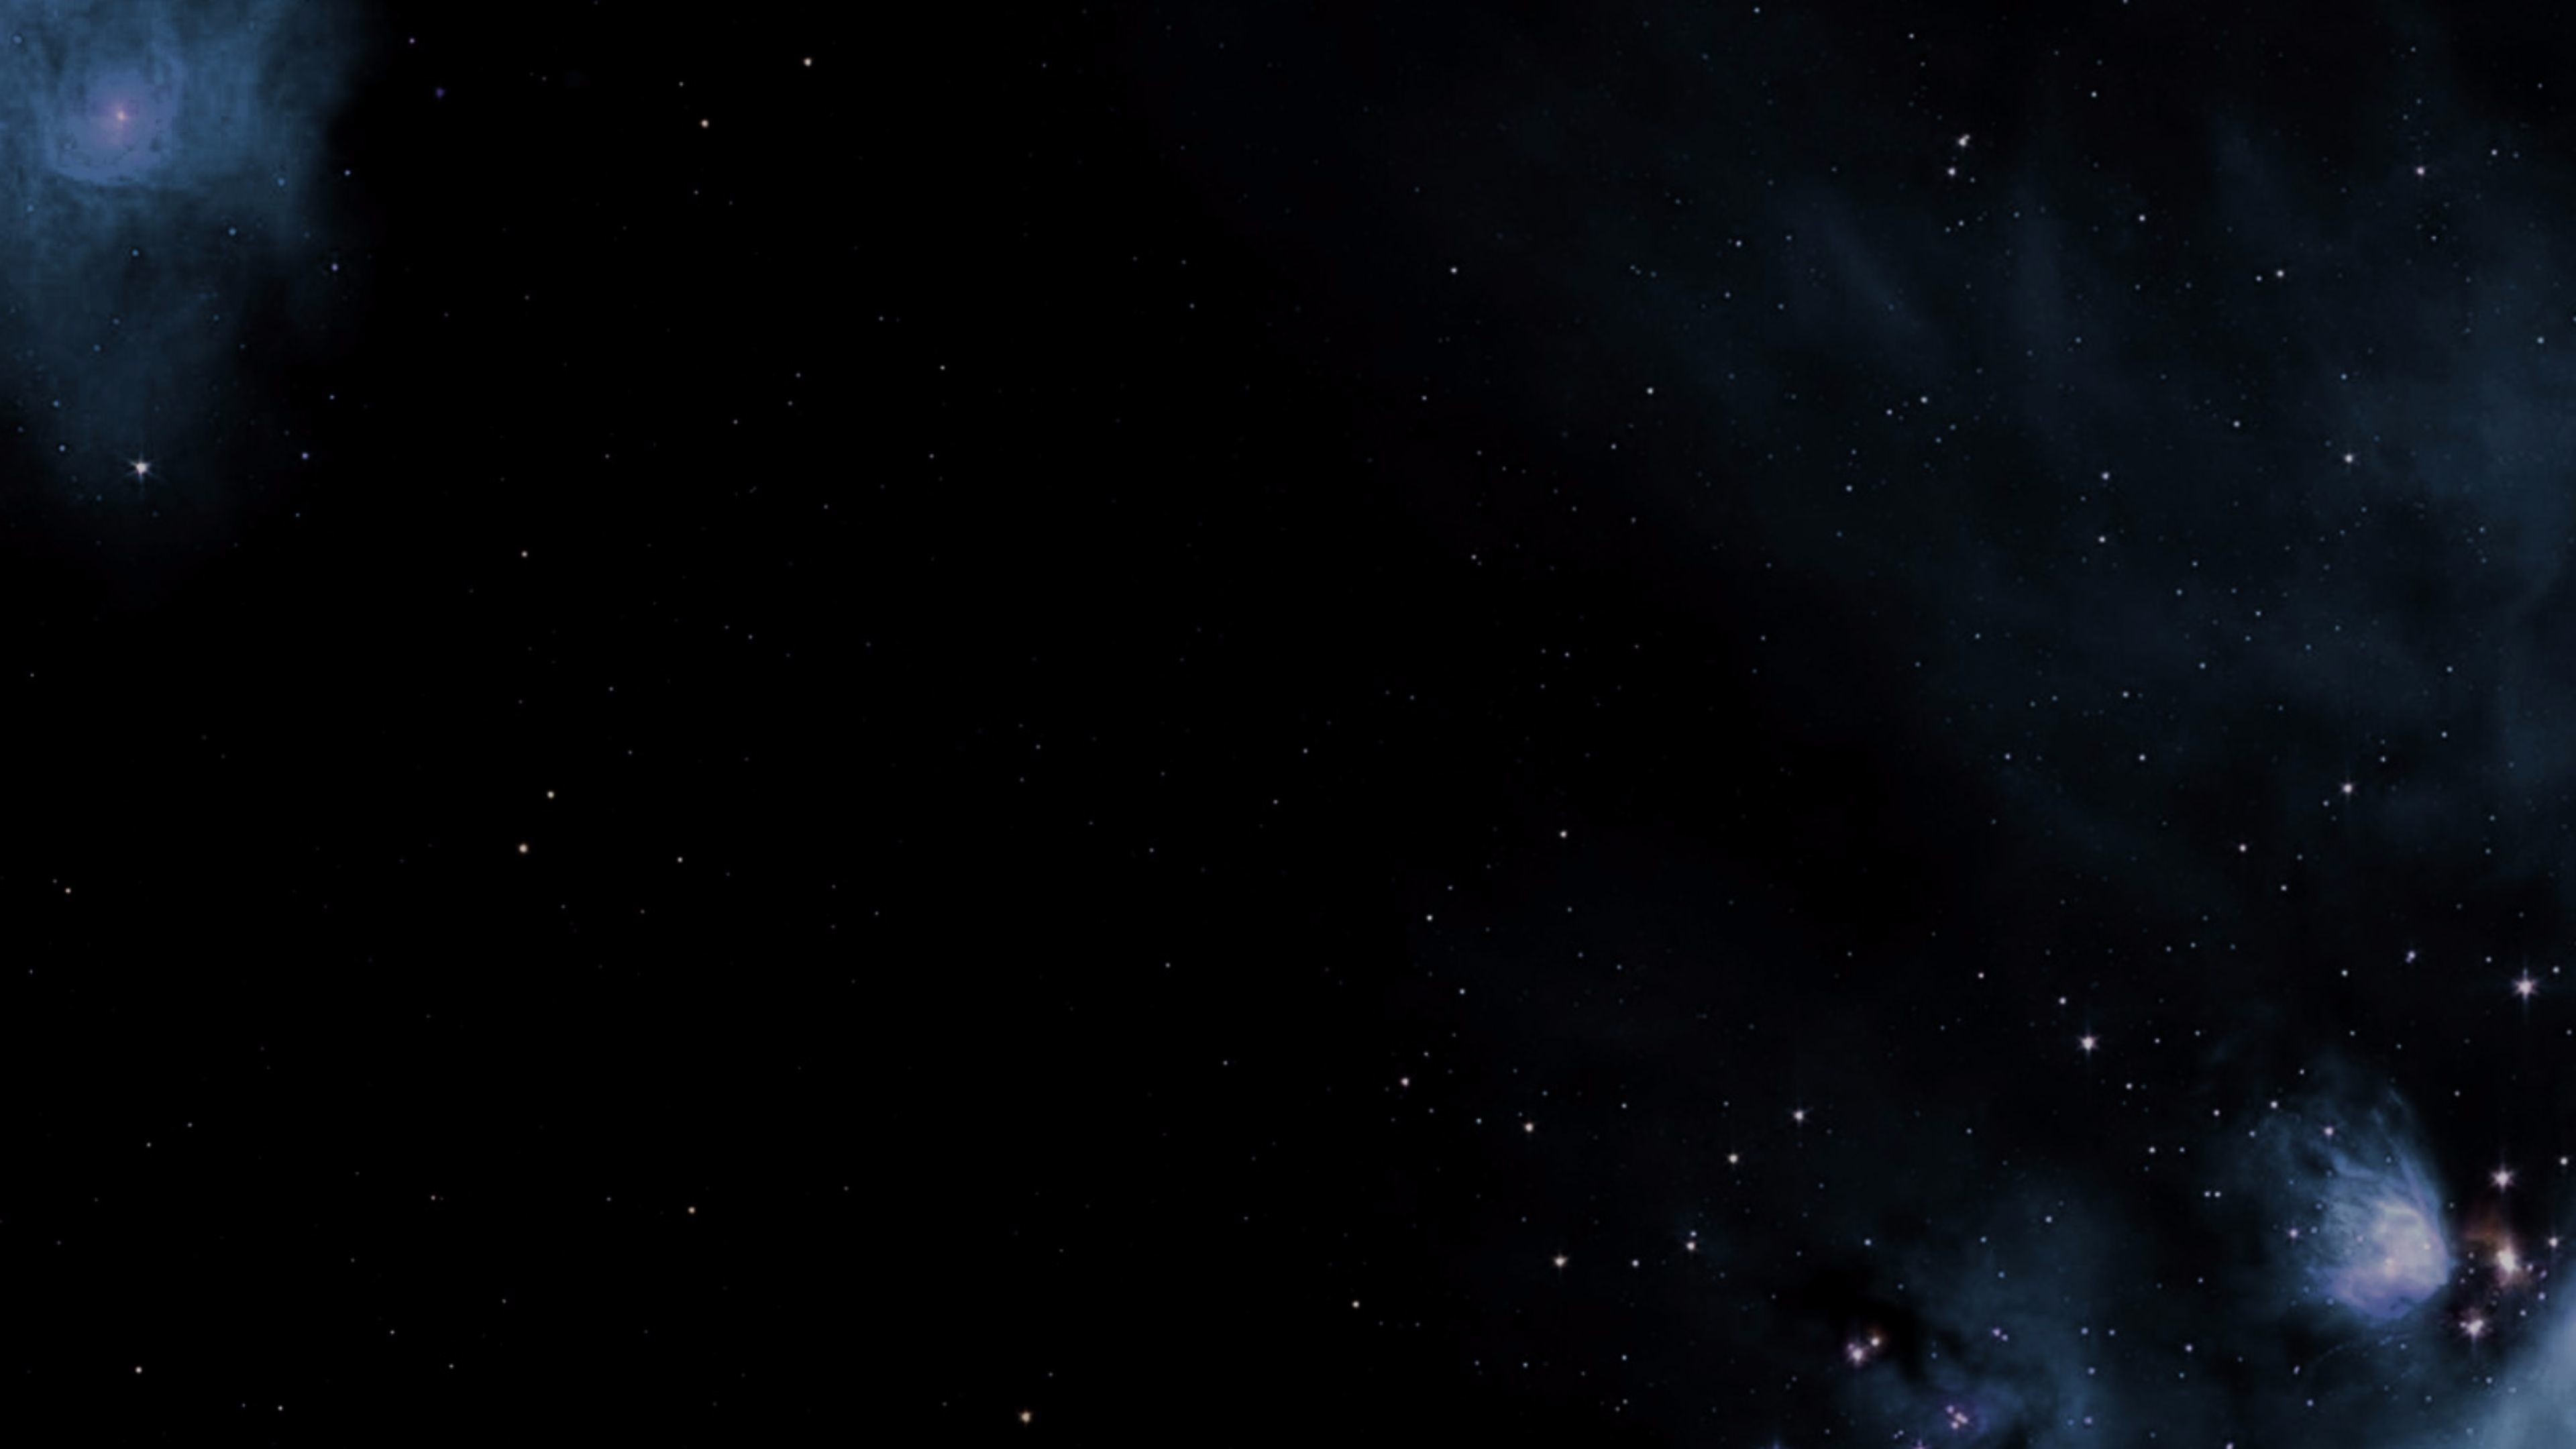 Dark Space Wallpaper Free Download